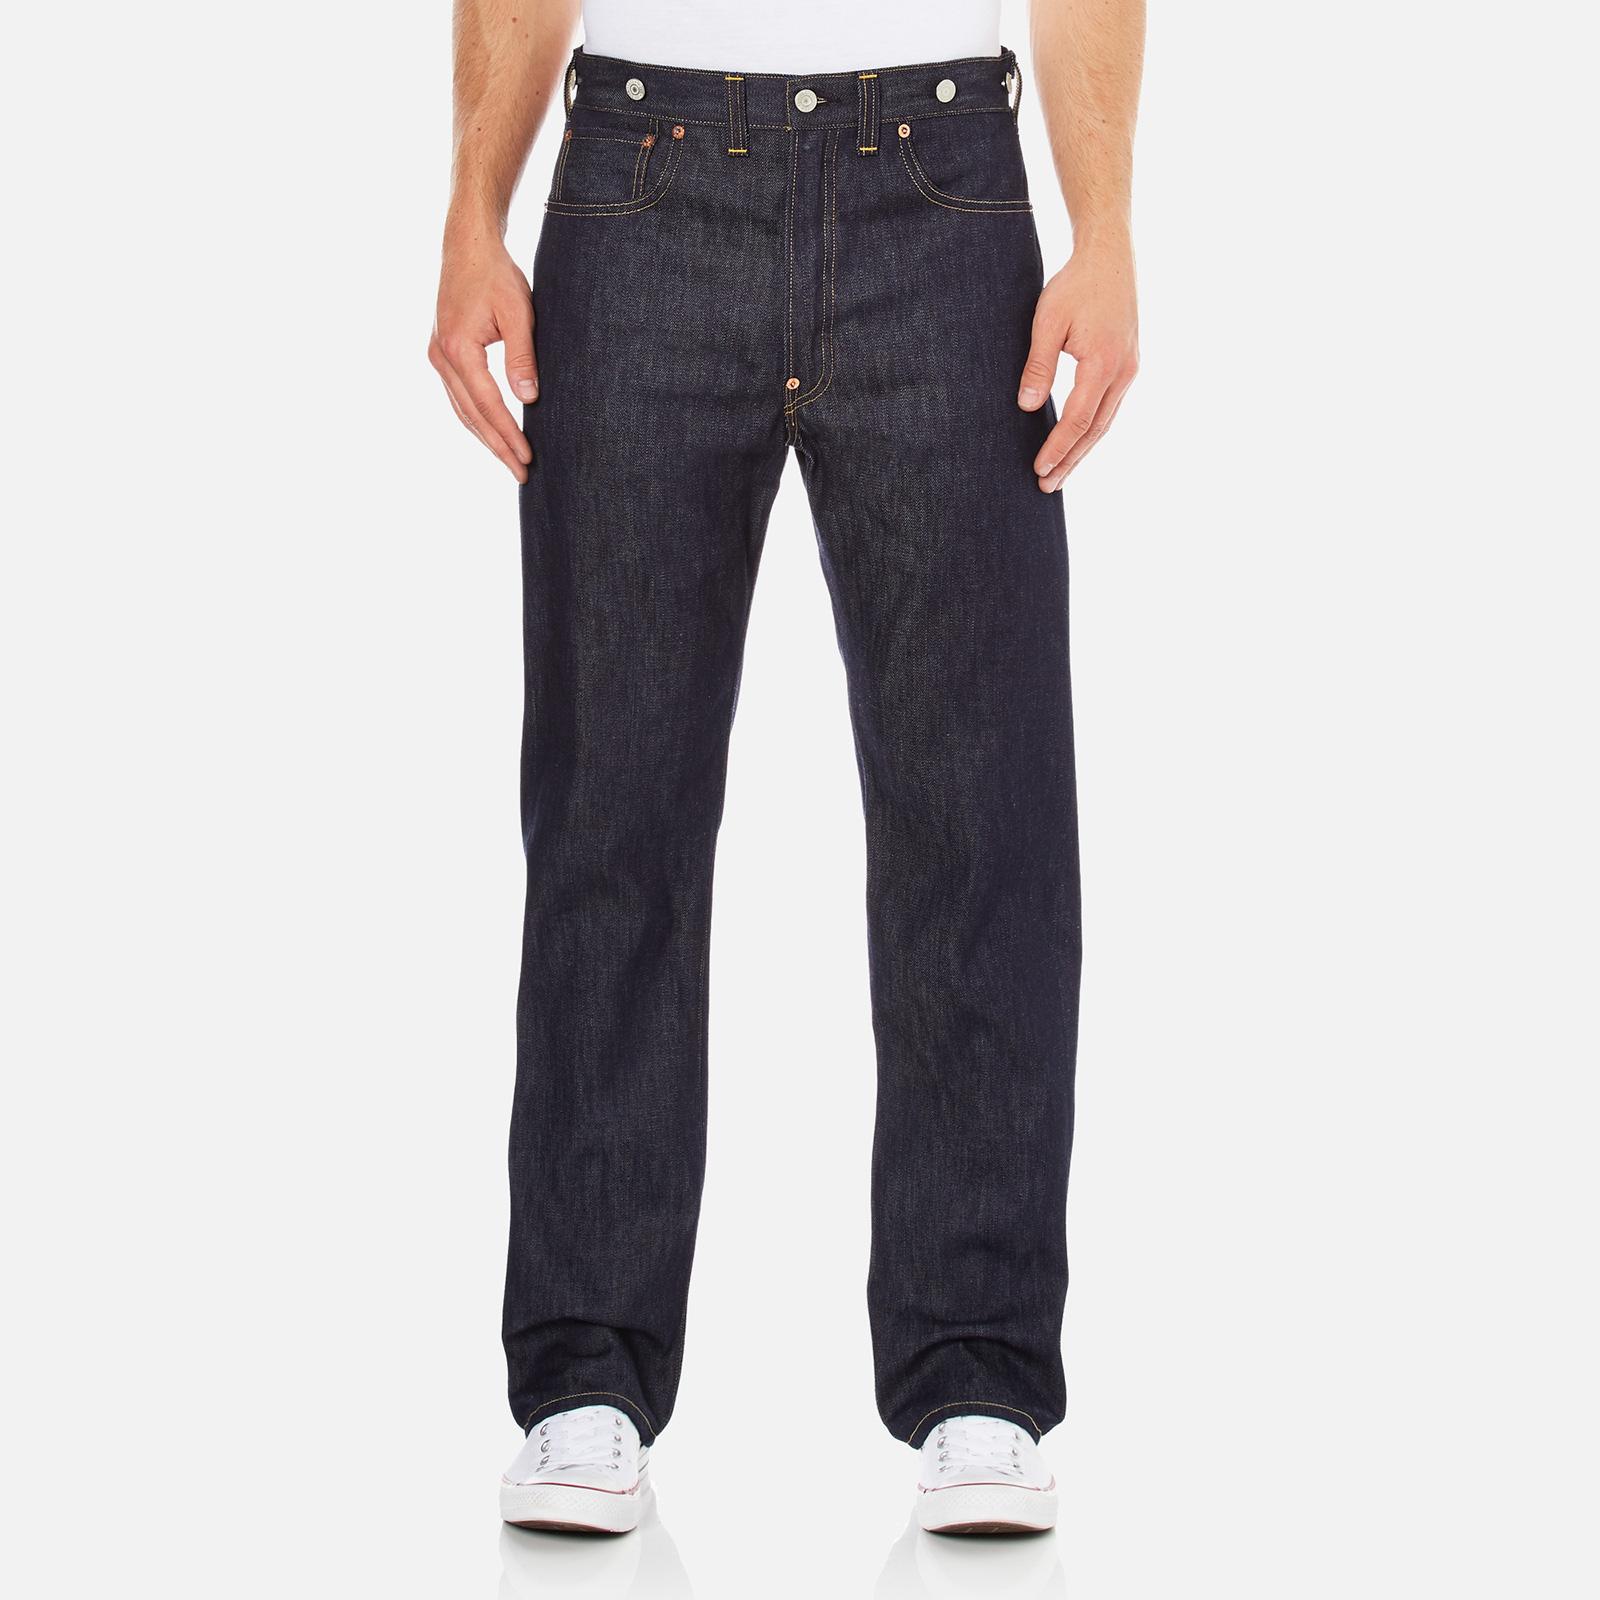 492b4472 Levi's Vintage Men's 1933 501 5 Pocket Straight Fit Jeans - Rigid - Free UK  Delivery over £50